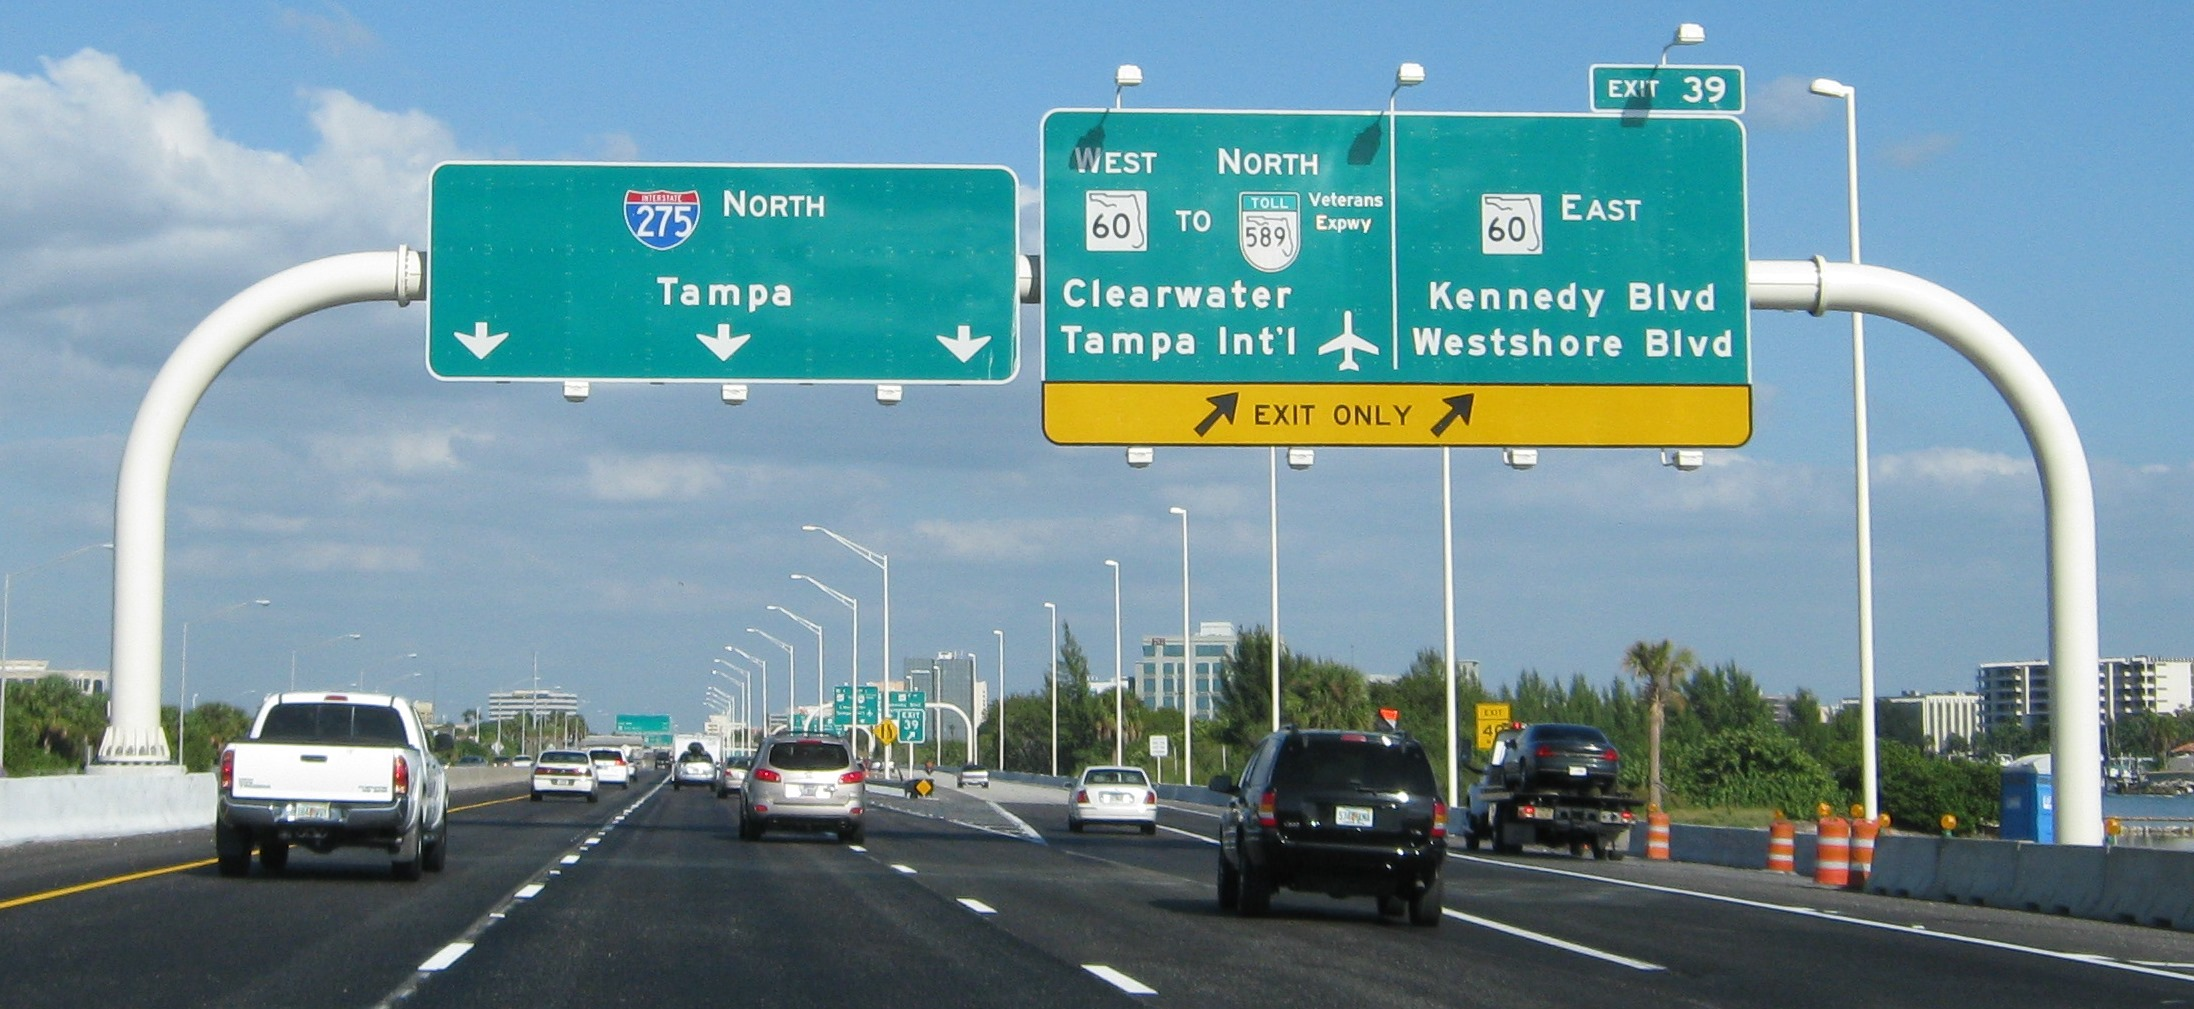 Картинки по запросу I-275 tampa